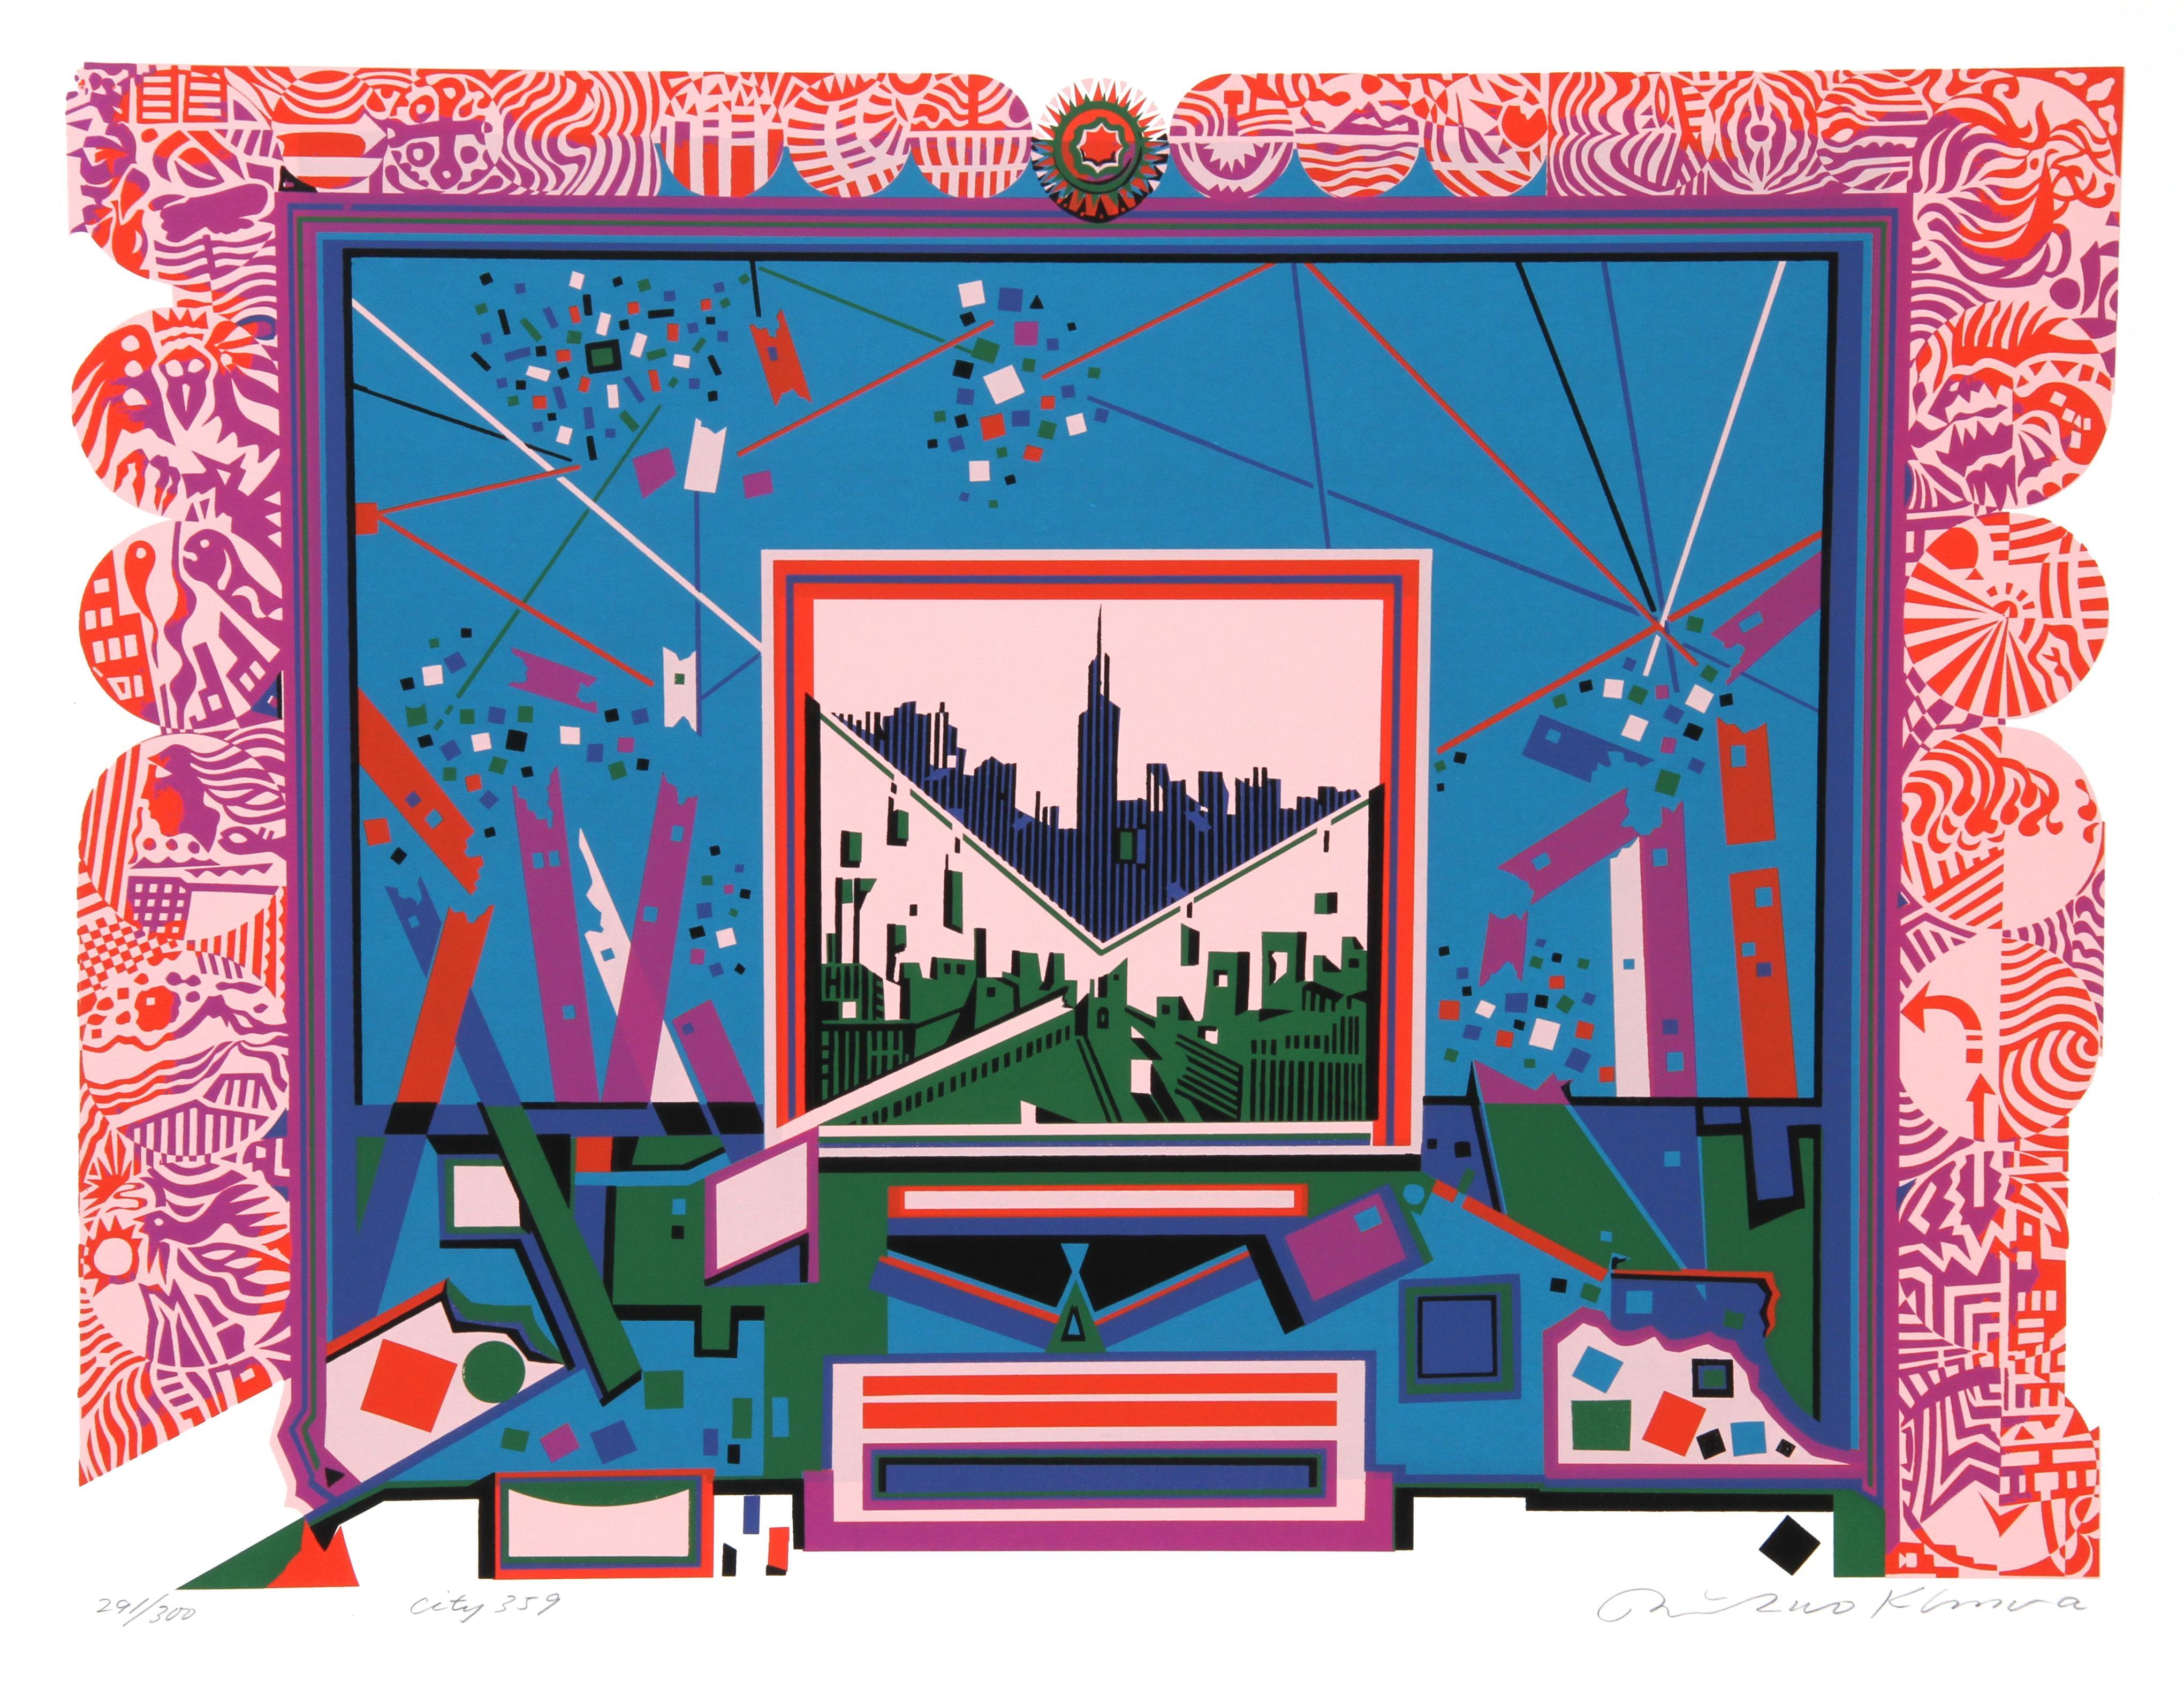 City 359, Serigraph by Risaburo Kimura